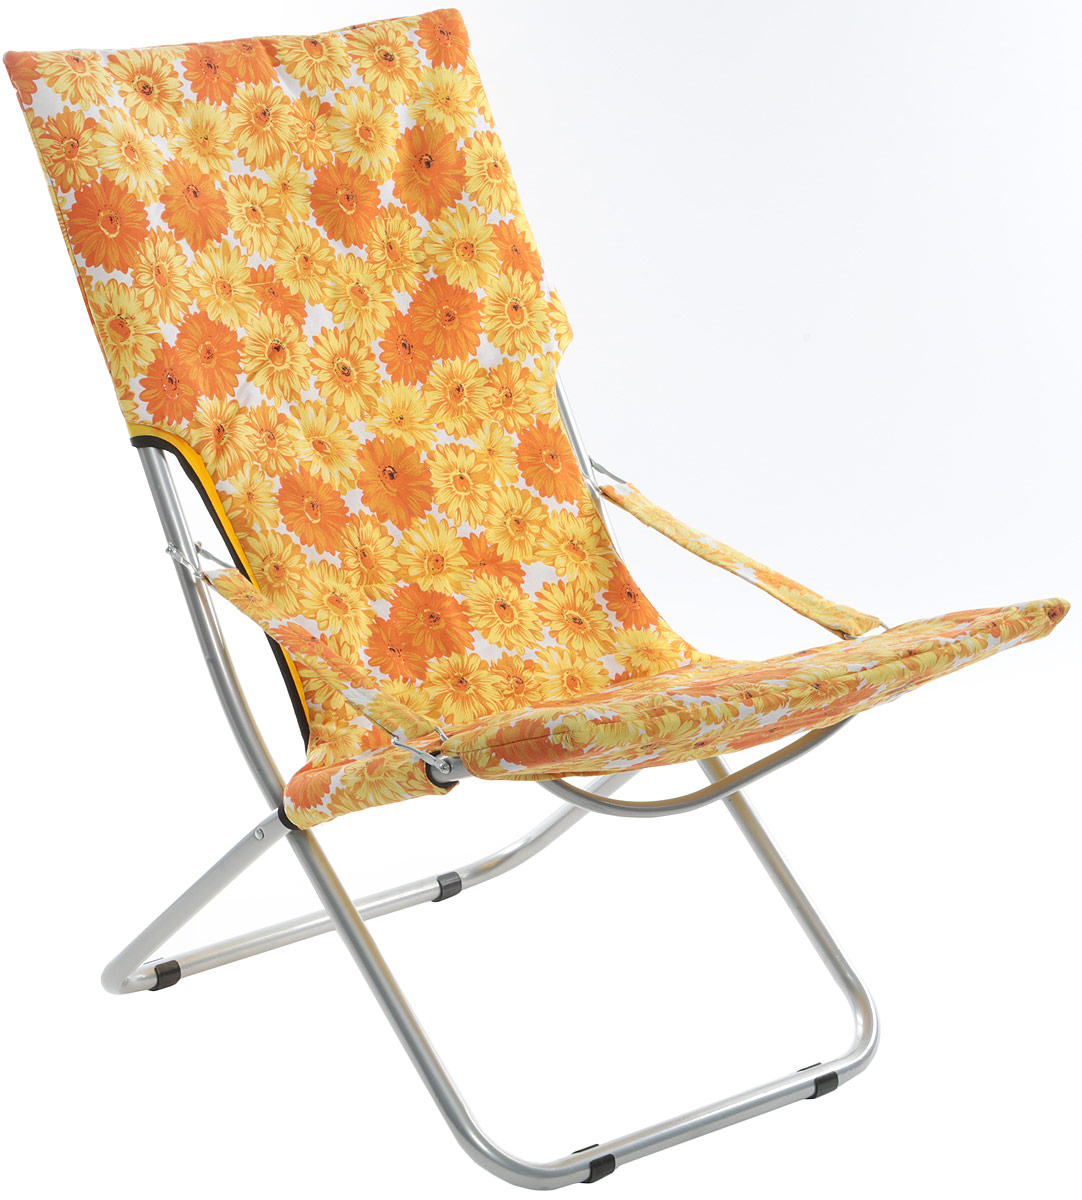 Кресло складное Wildman, цвет: желтый, 73 х 60 х 100 см